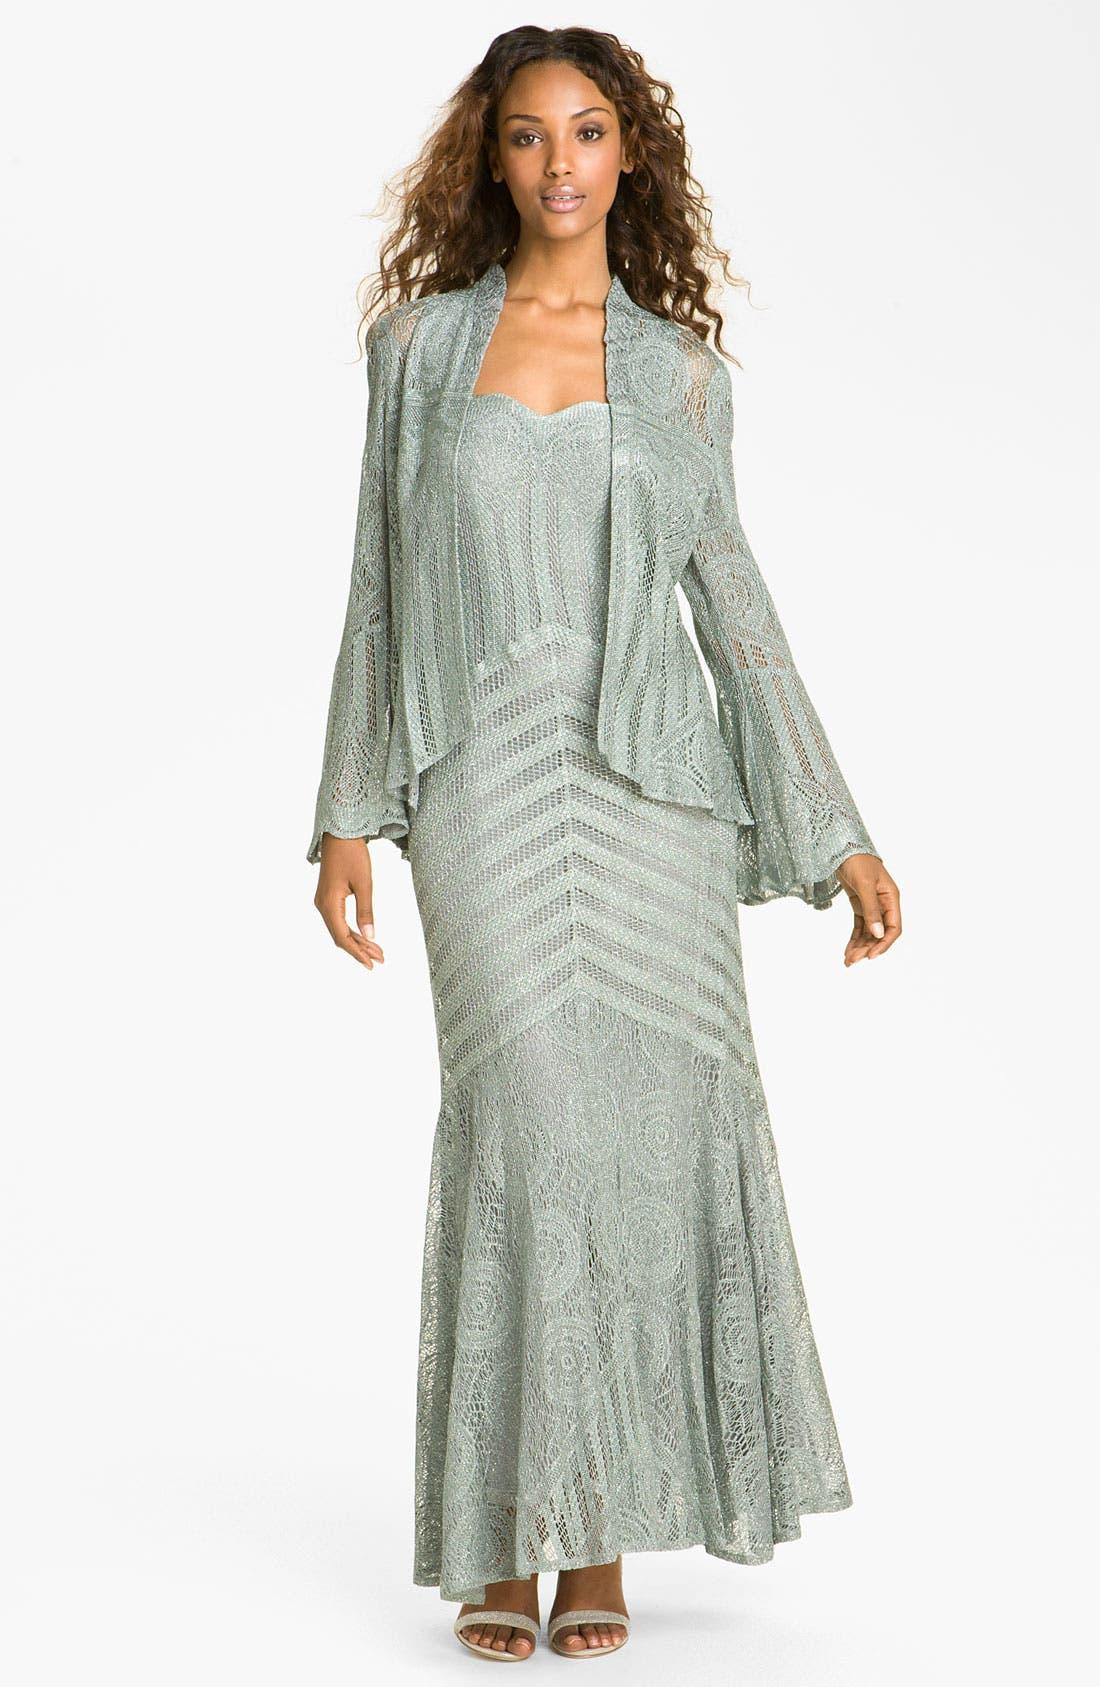 Alternate Image 1 Selected - Damianou 'Circles' Metallic Knit Gown & Jacket